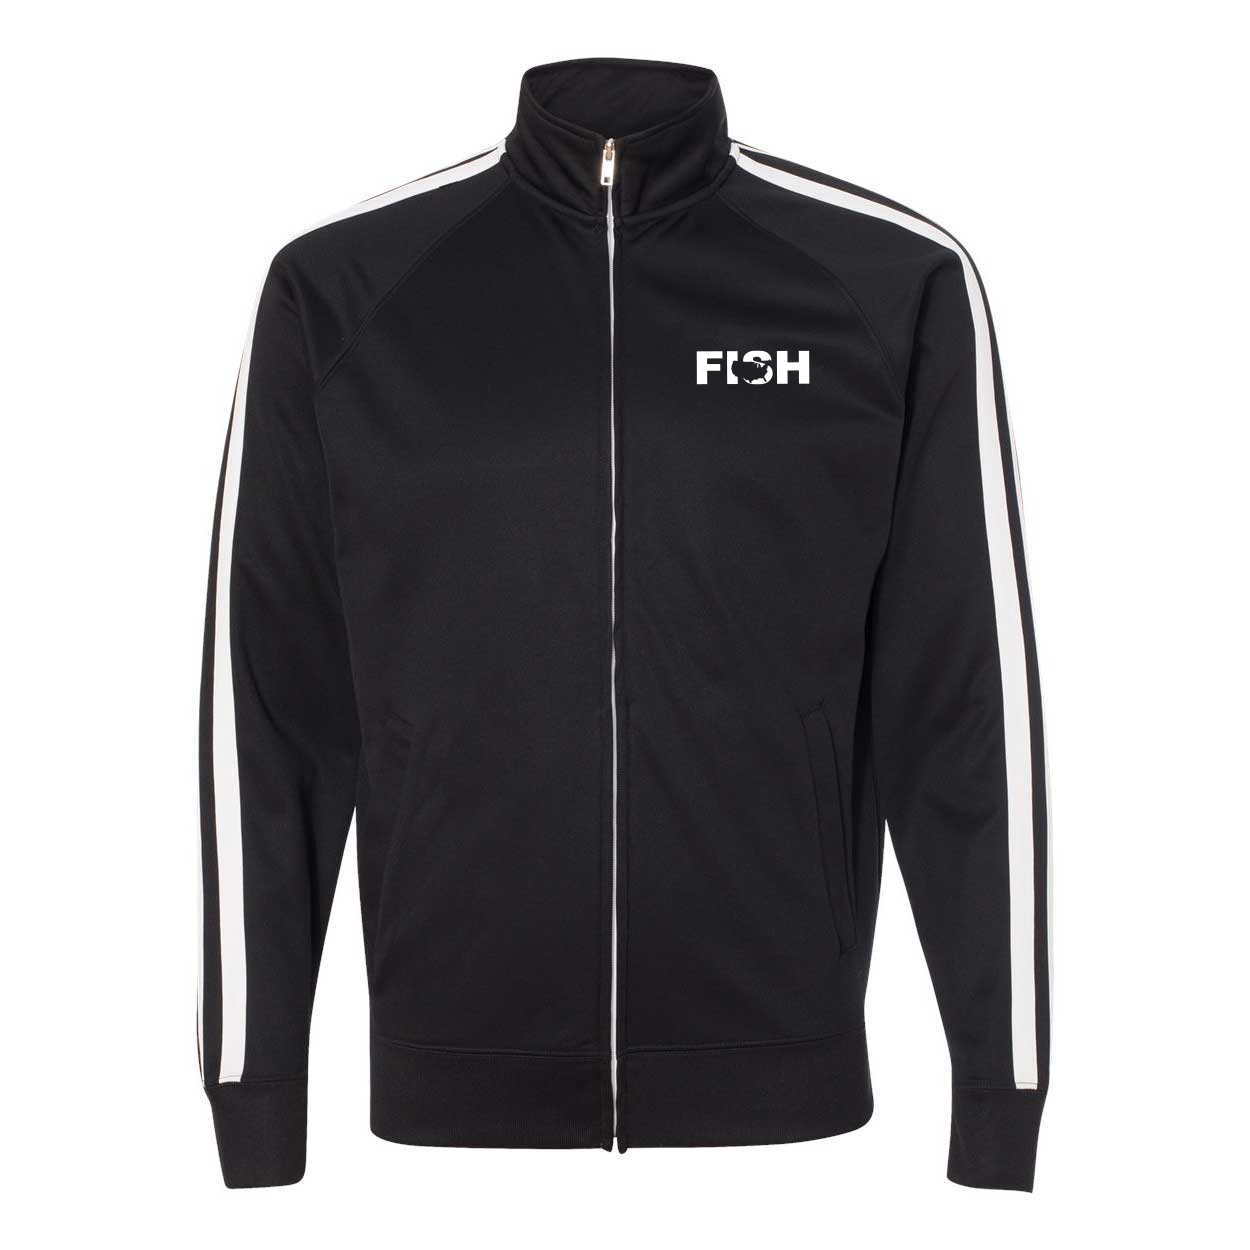 Fish United States Classic Track Jacket Black/White (White Logo)